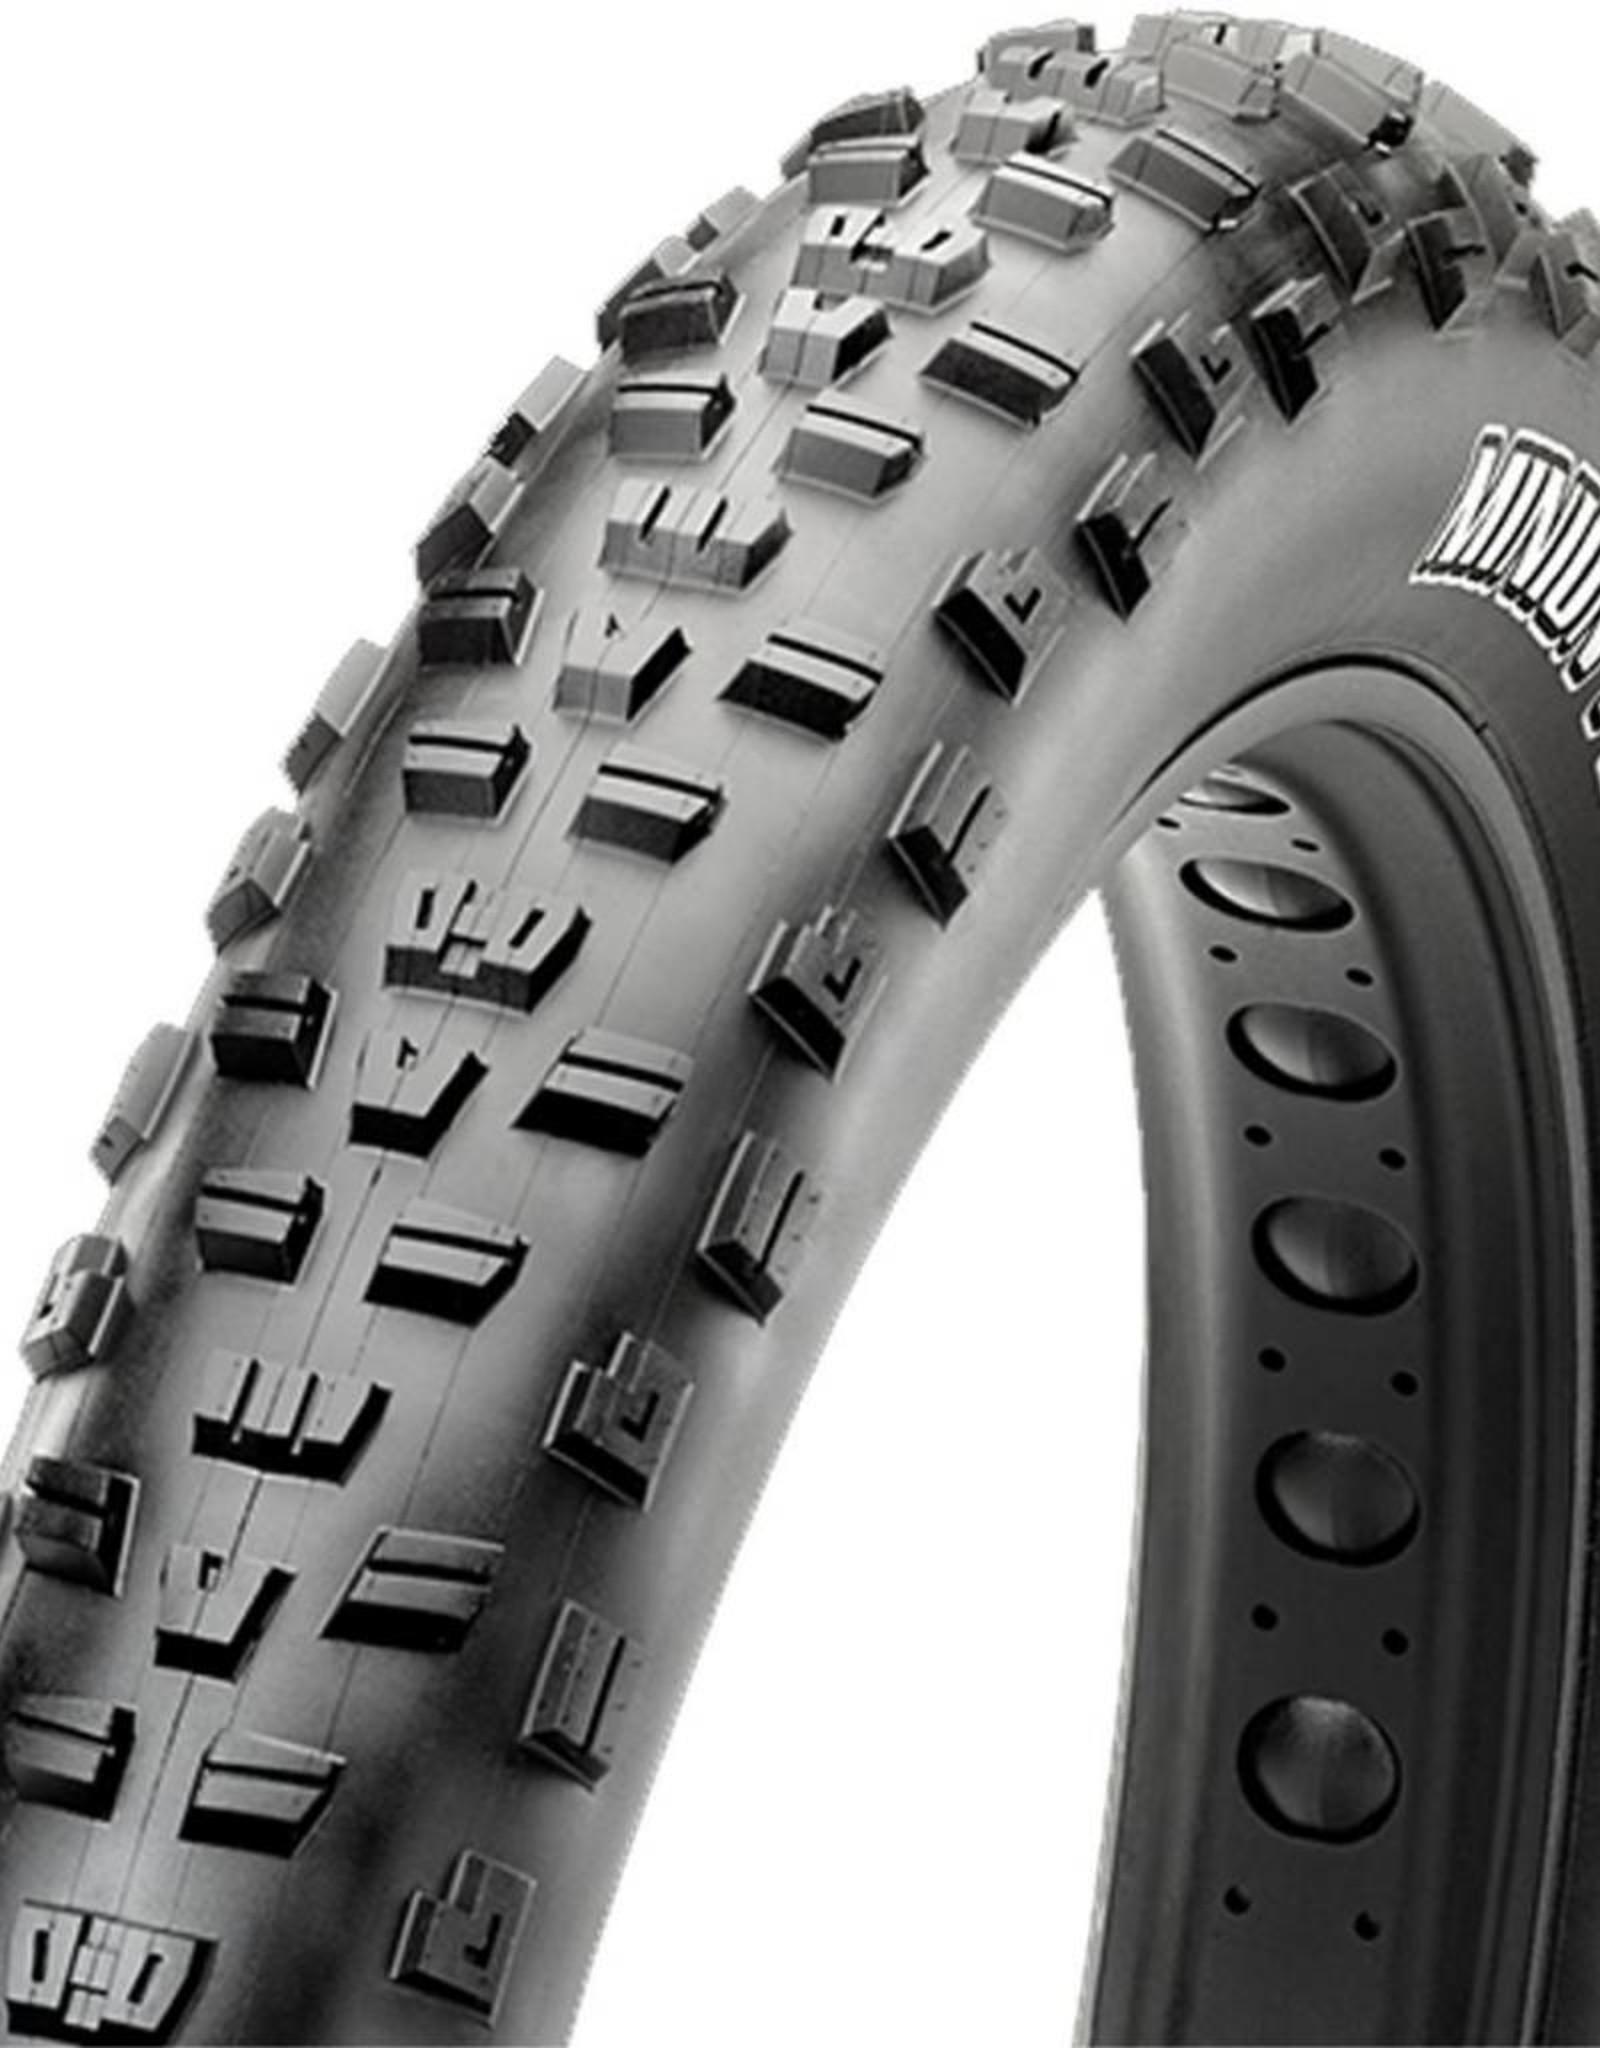 Maxxis Maxxis Minion 26 x 4.80 FBR Tire, Folding, 120tpi, Dual Compound